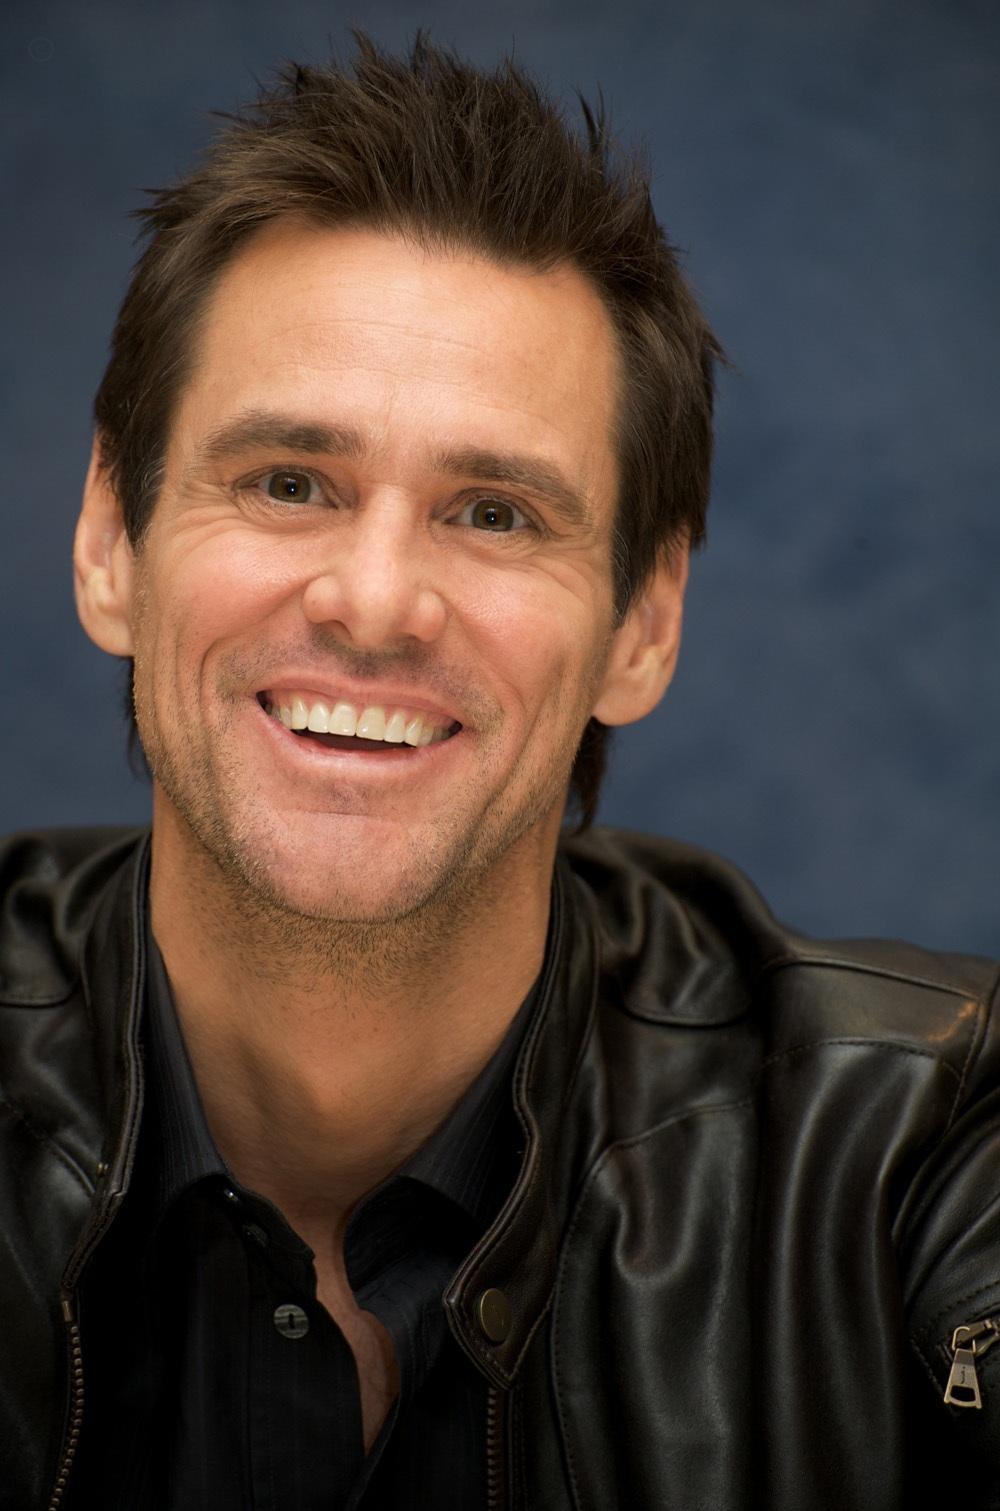 Nam diễn viên Jim Carrey